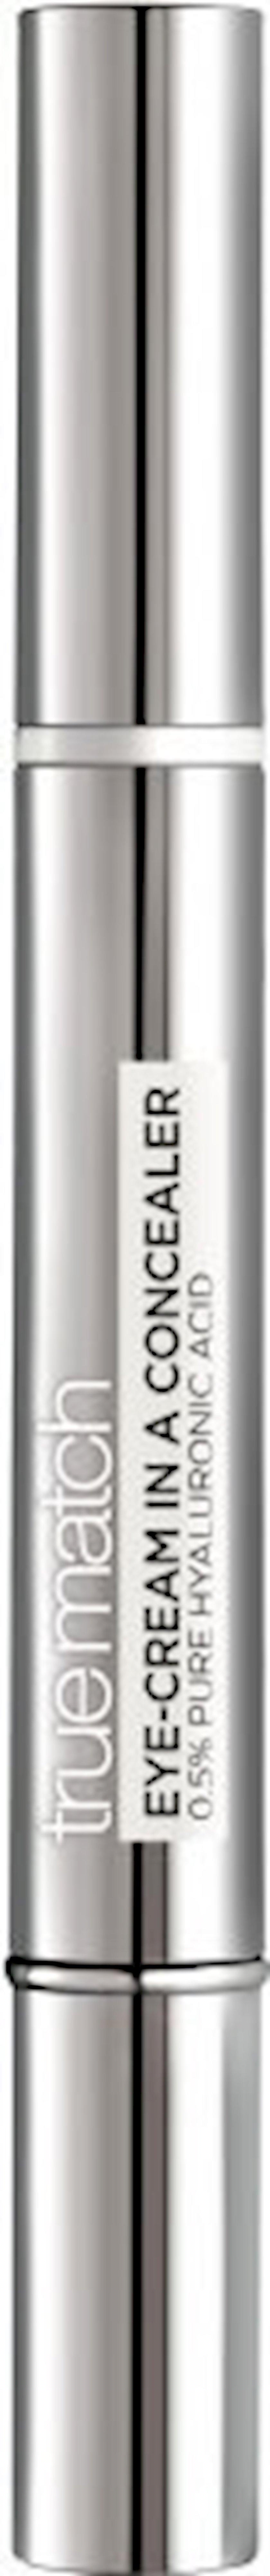 Krem-konsiler L'Oréal Paris True Match çalar 1-2D, 2 ml